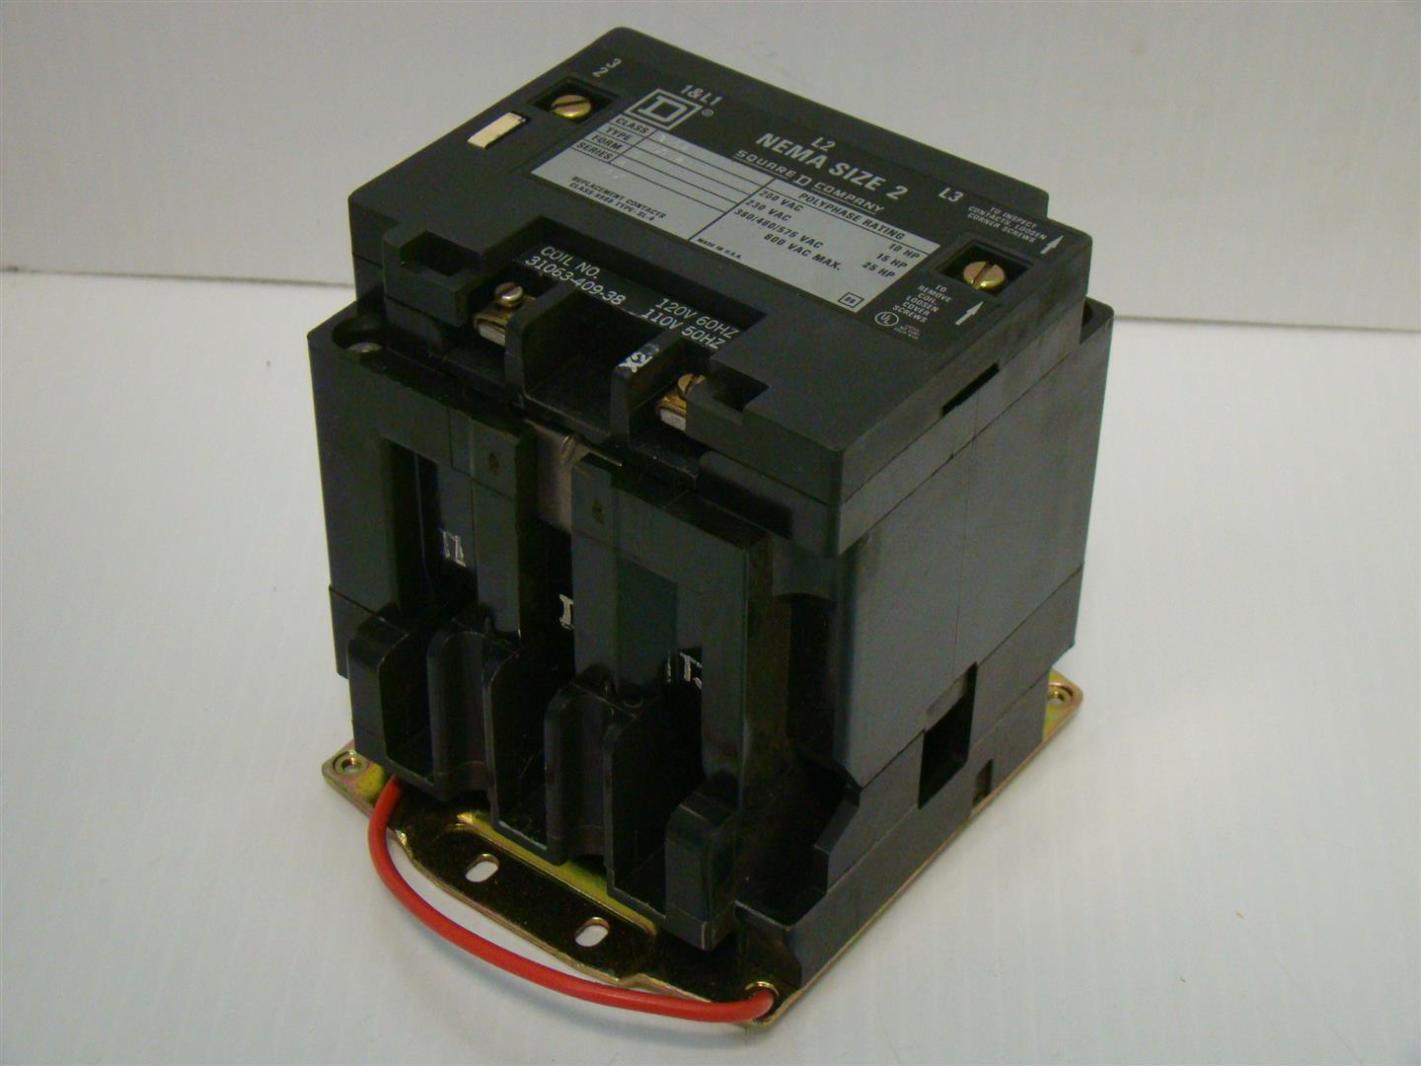 square d nema size 2 motor starter 600vac max 10hp 8502